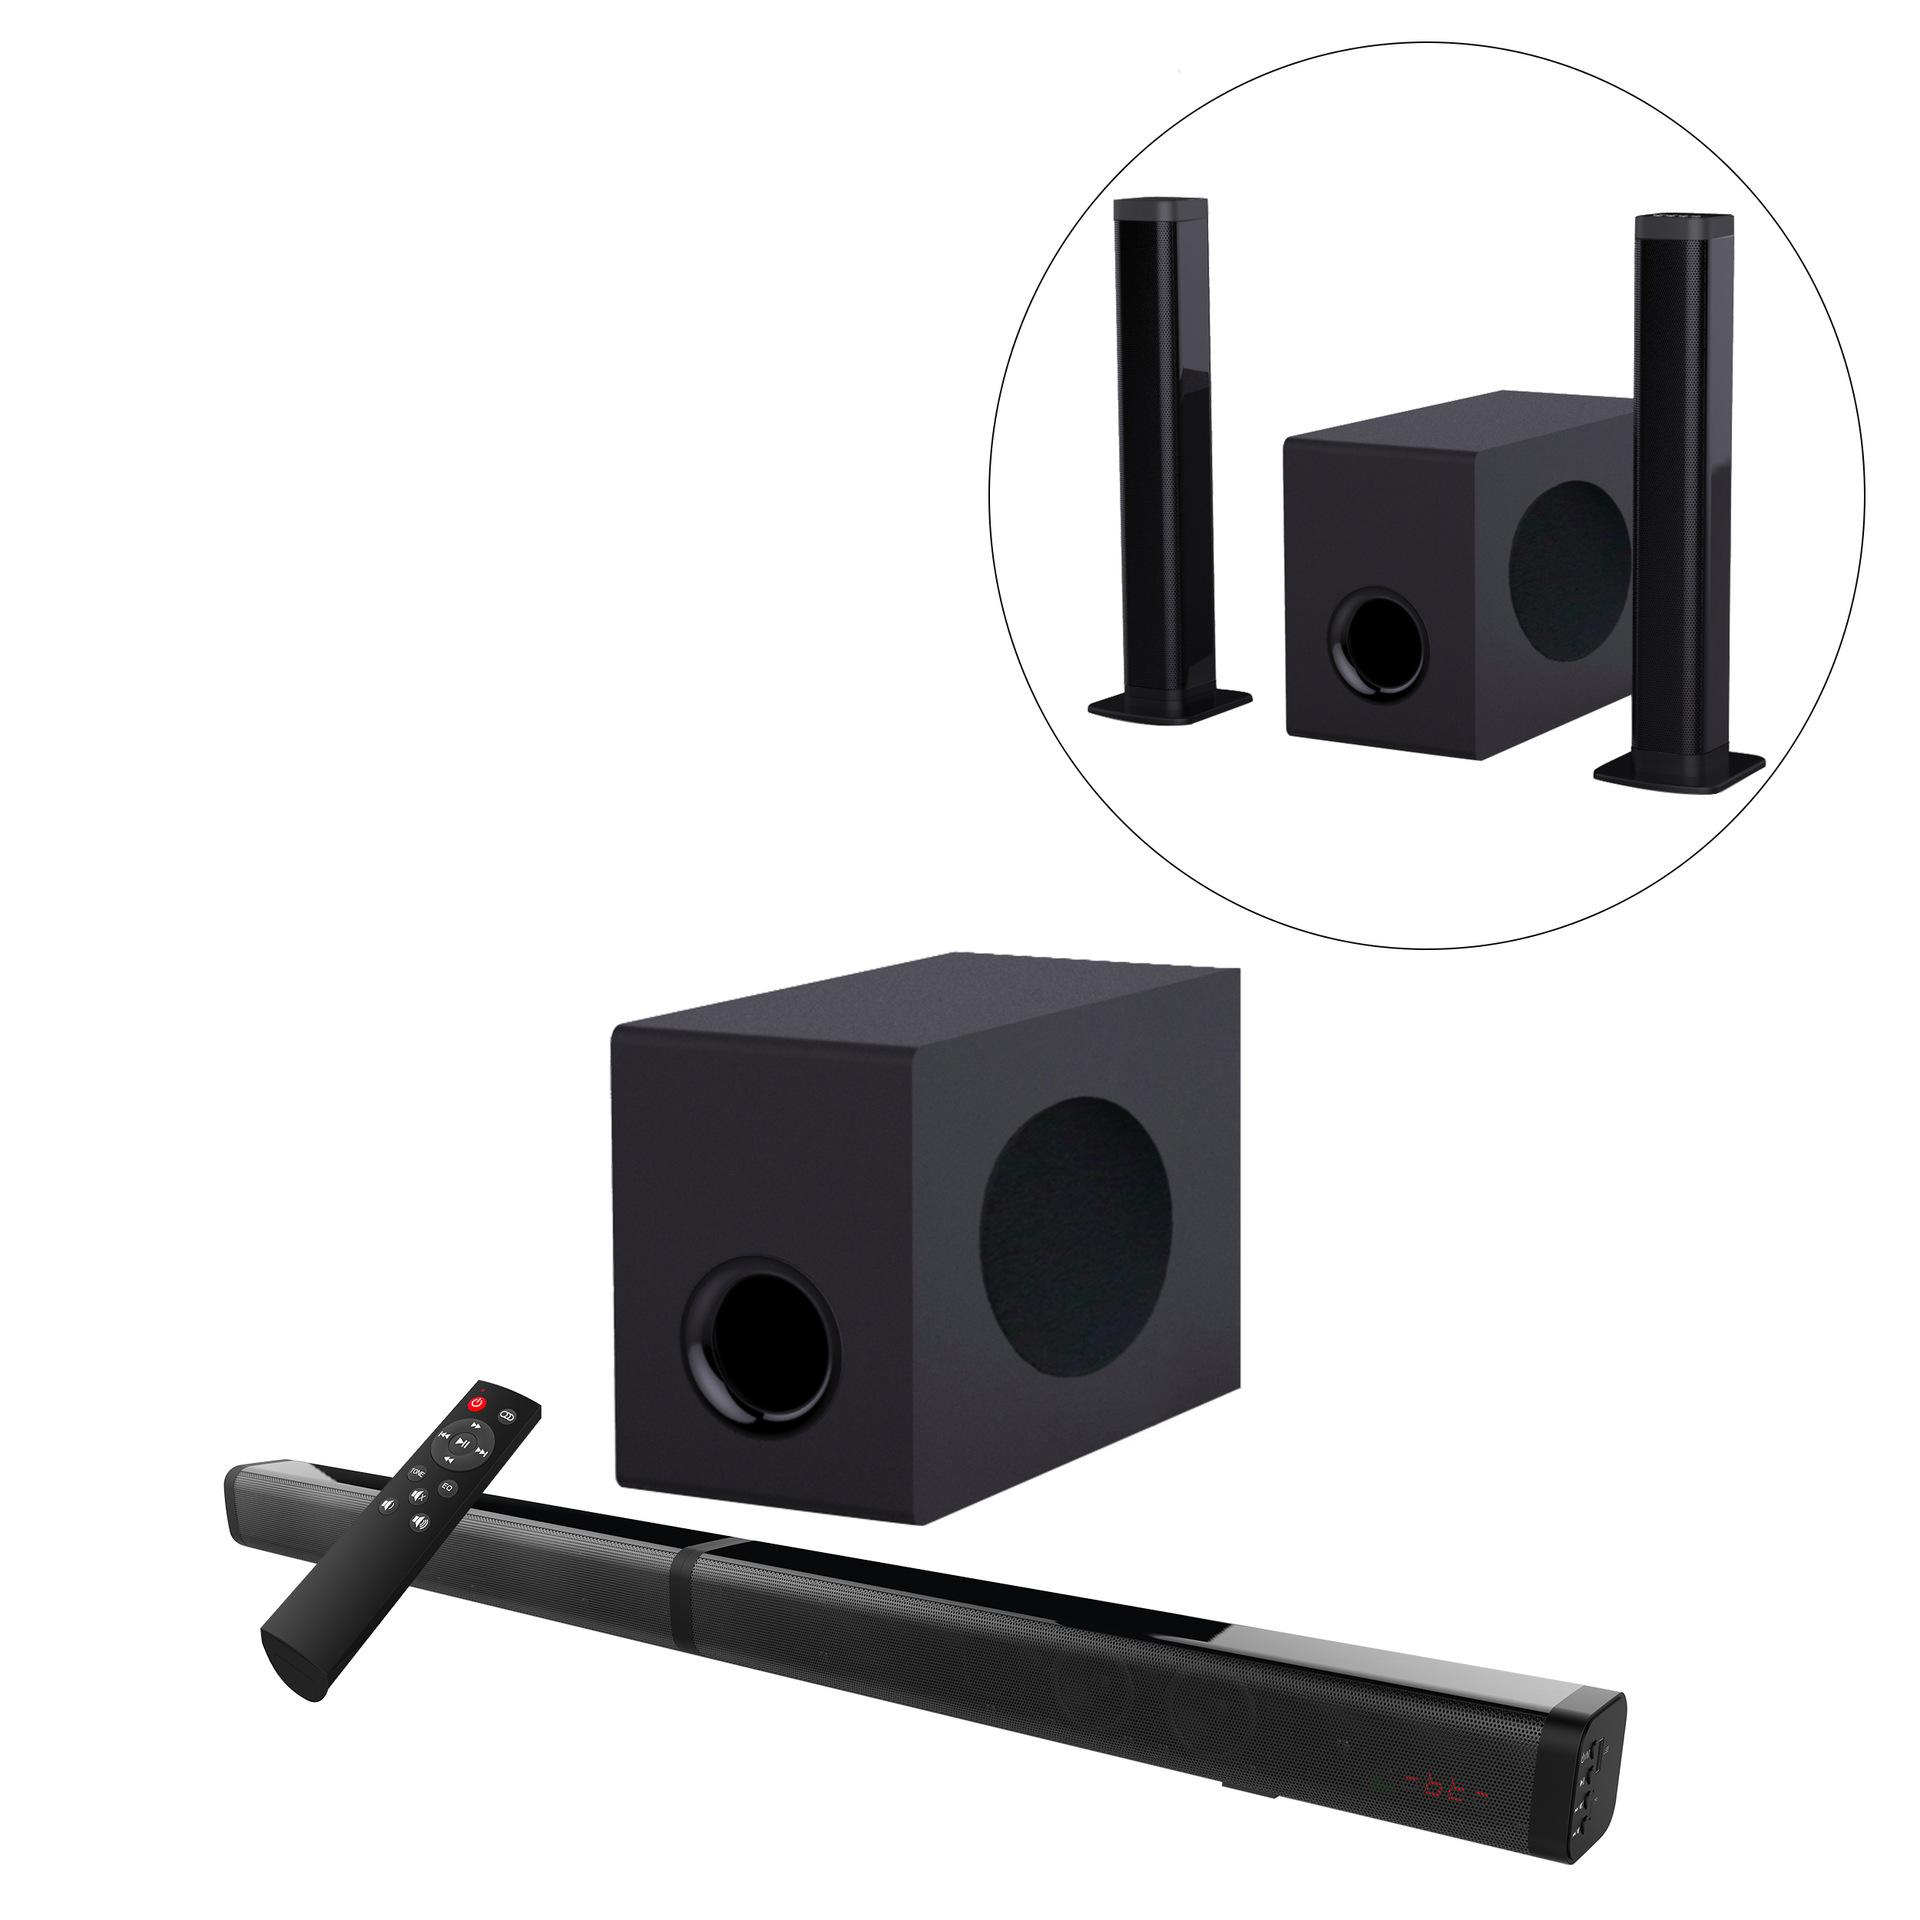 soundbar bluetooth speaker 2020 new home theater TV audio subwoofer echo wall speaker